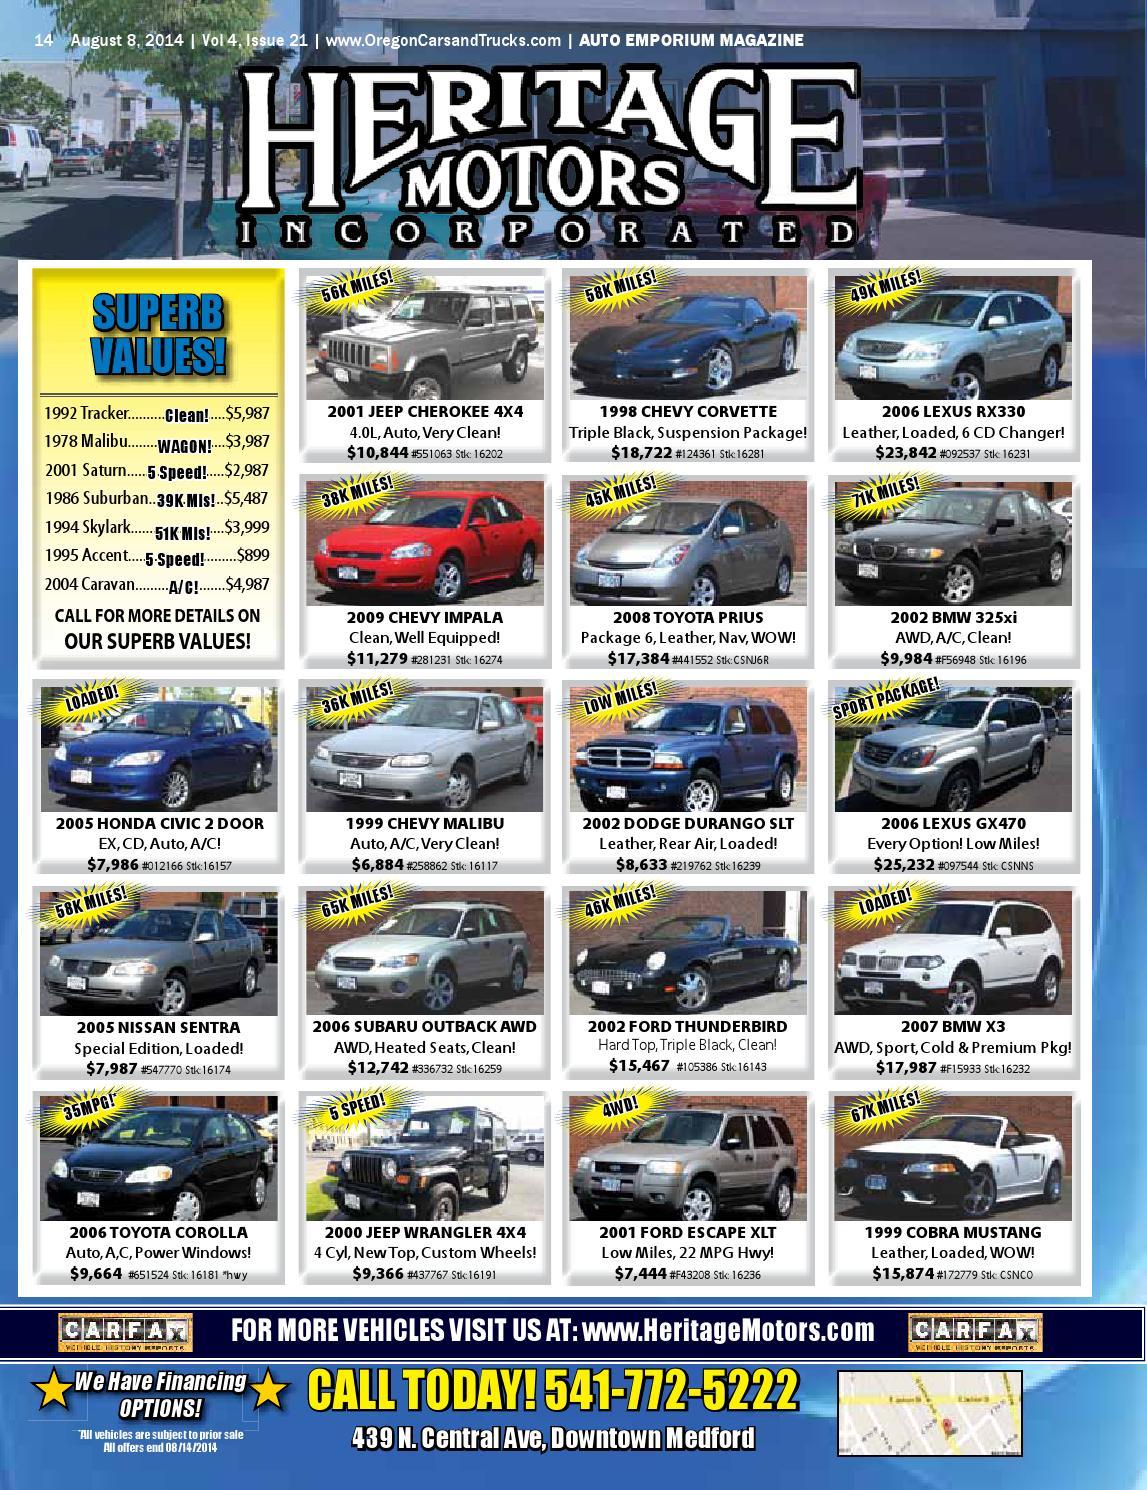 August 8, 2014 Auto Emporium by Rogue Publishing LLC - issuu